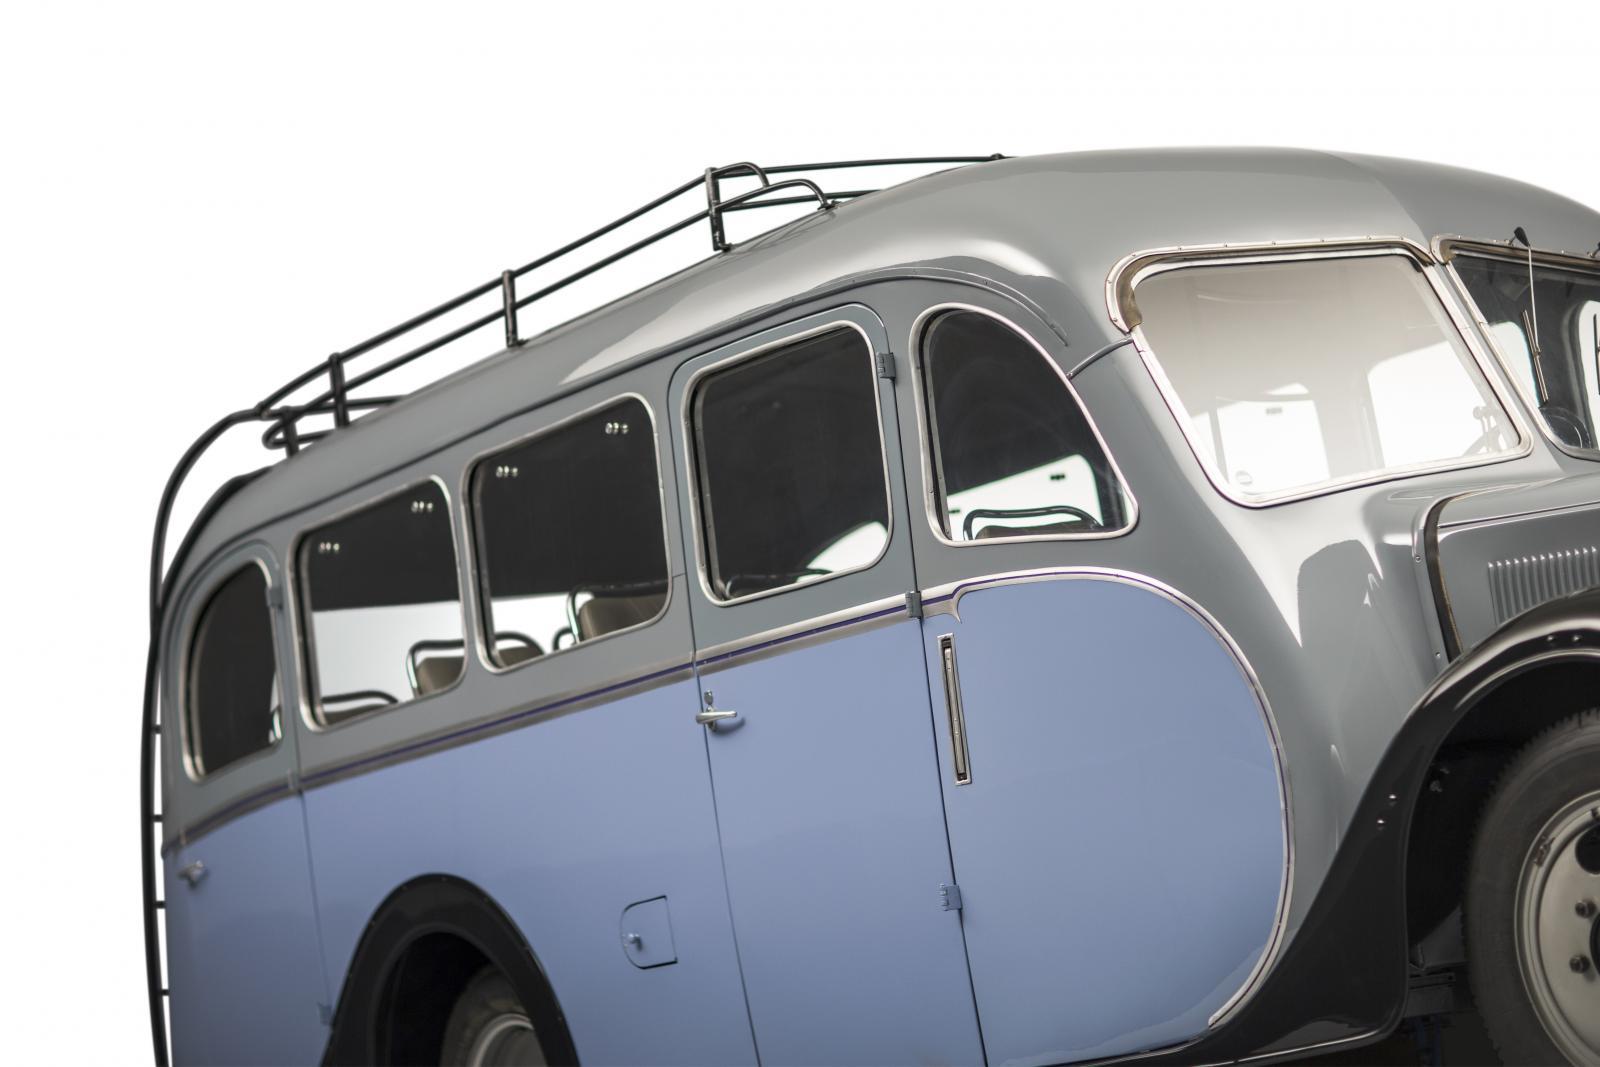 Bus U23